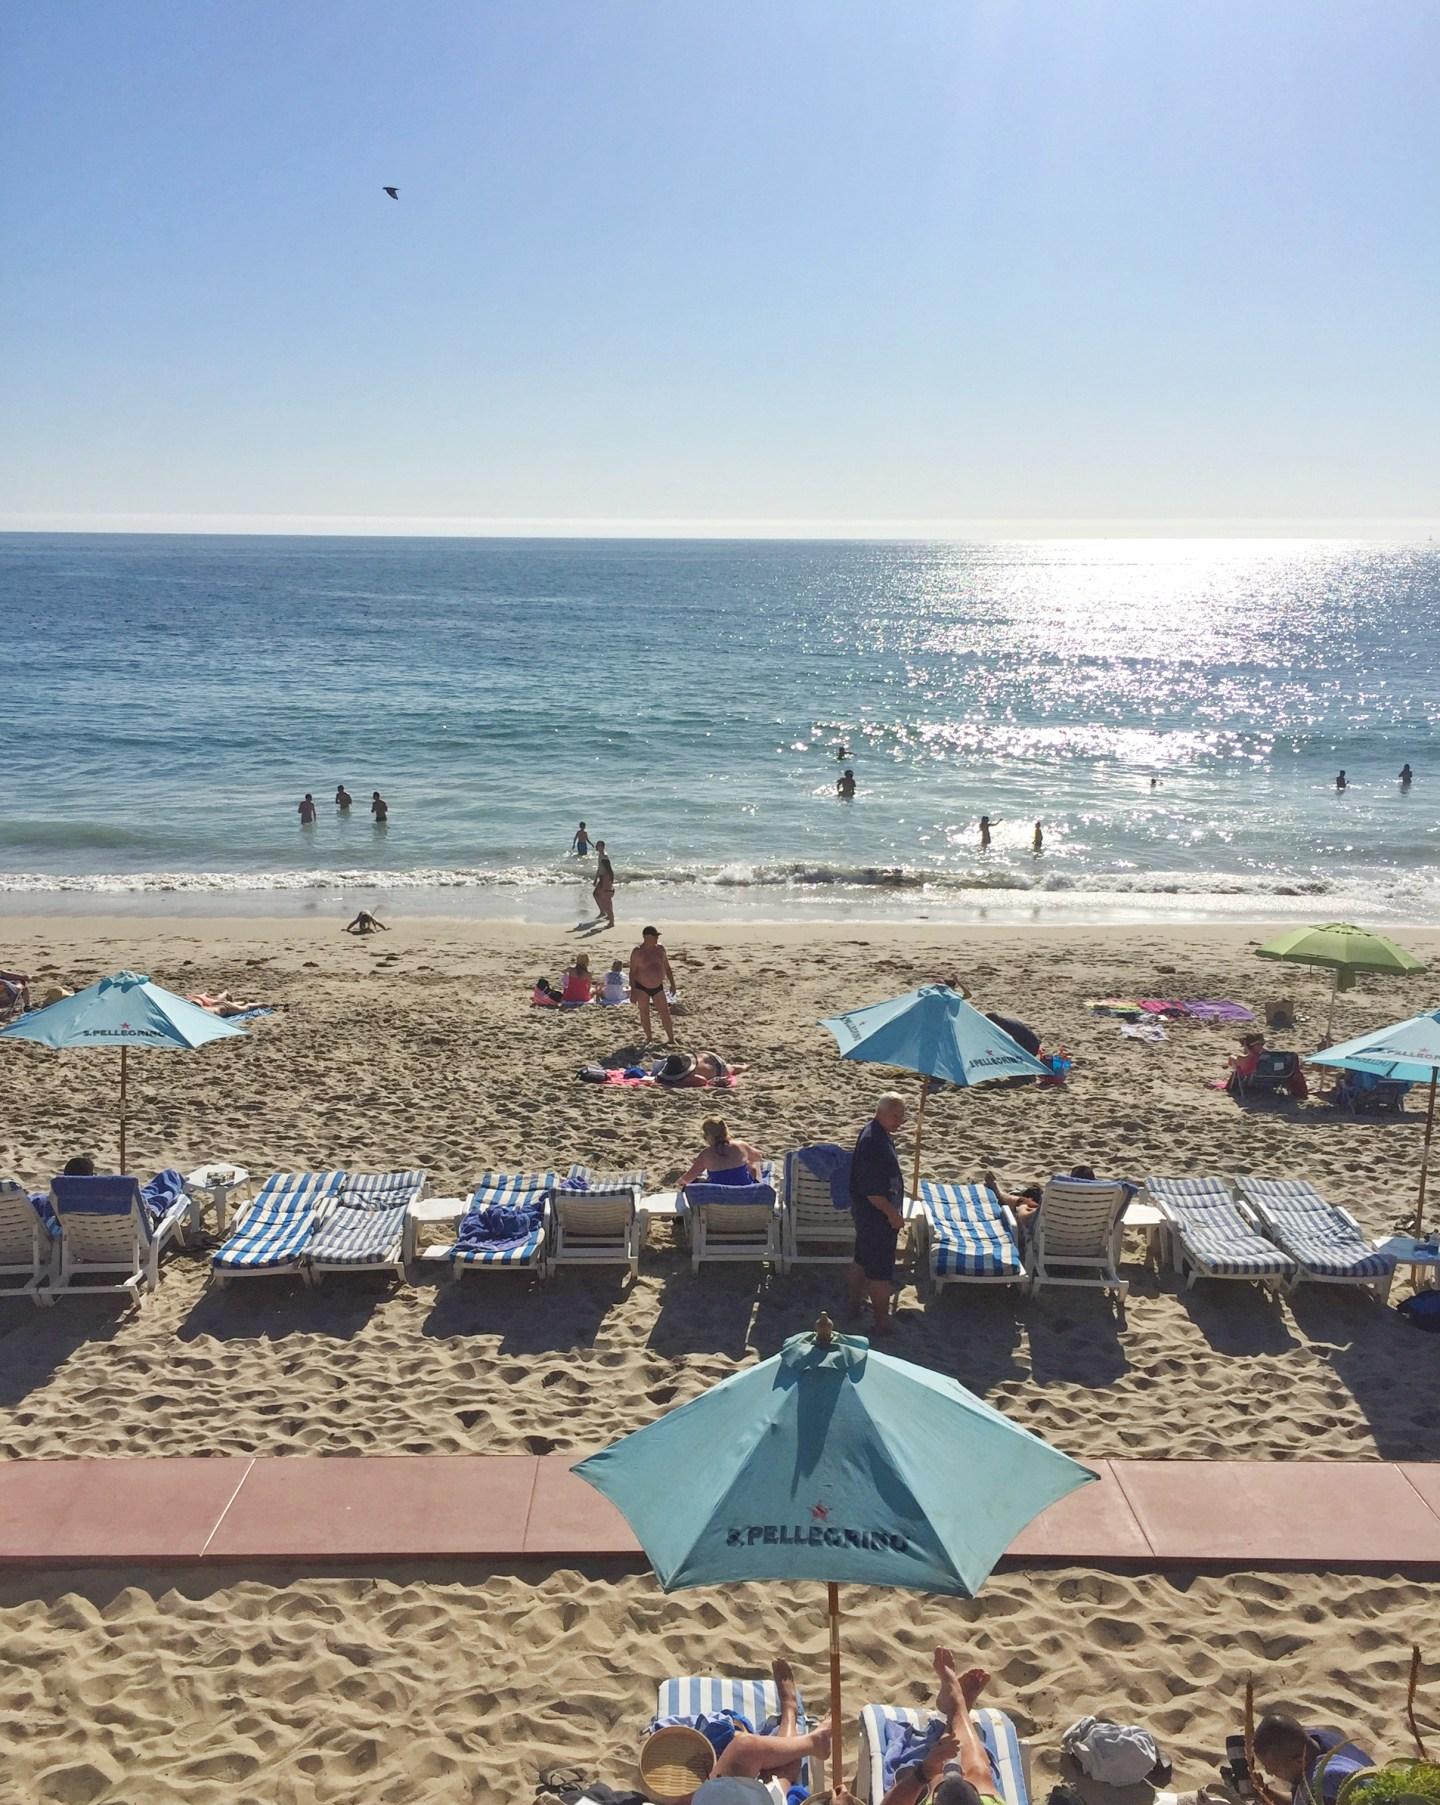 Sunbathers at Laguna Beach on a sunny day - Southern California